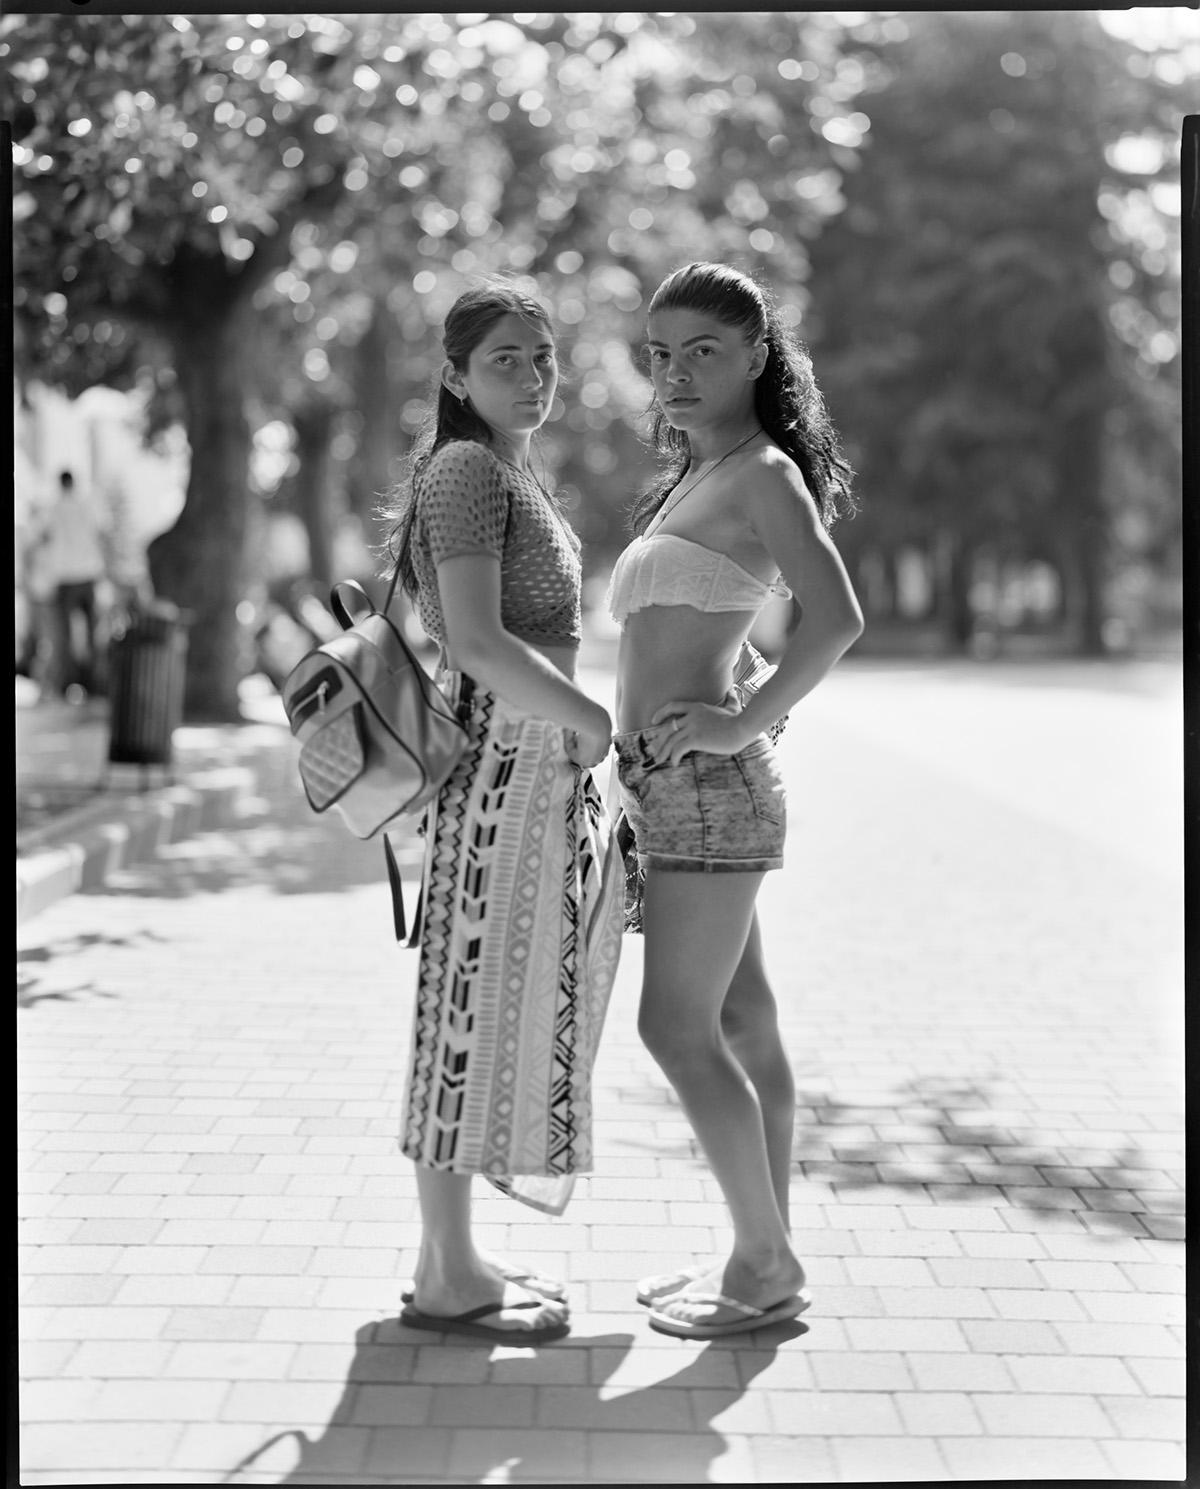 analog largeformatcamera largeformat 8x10 8x10camera blackandwhite Analogue street portrait reportage analog photography